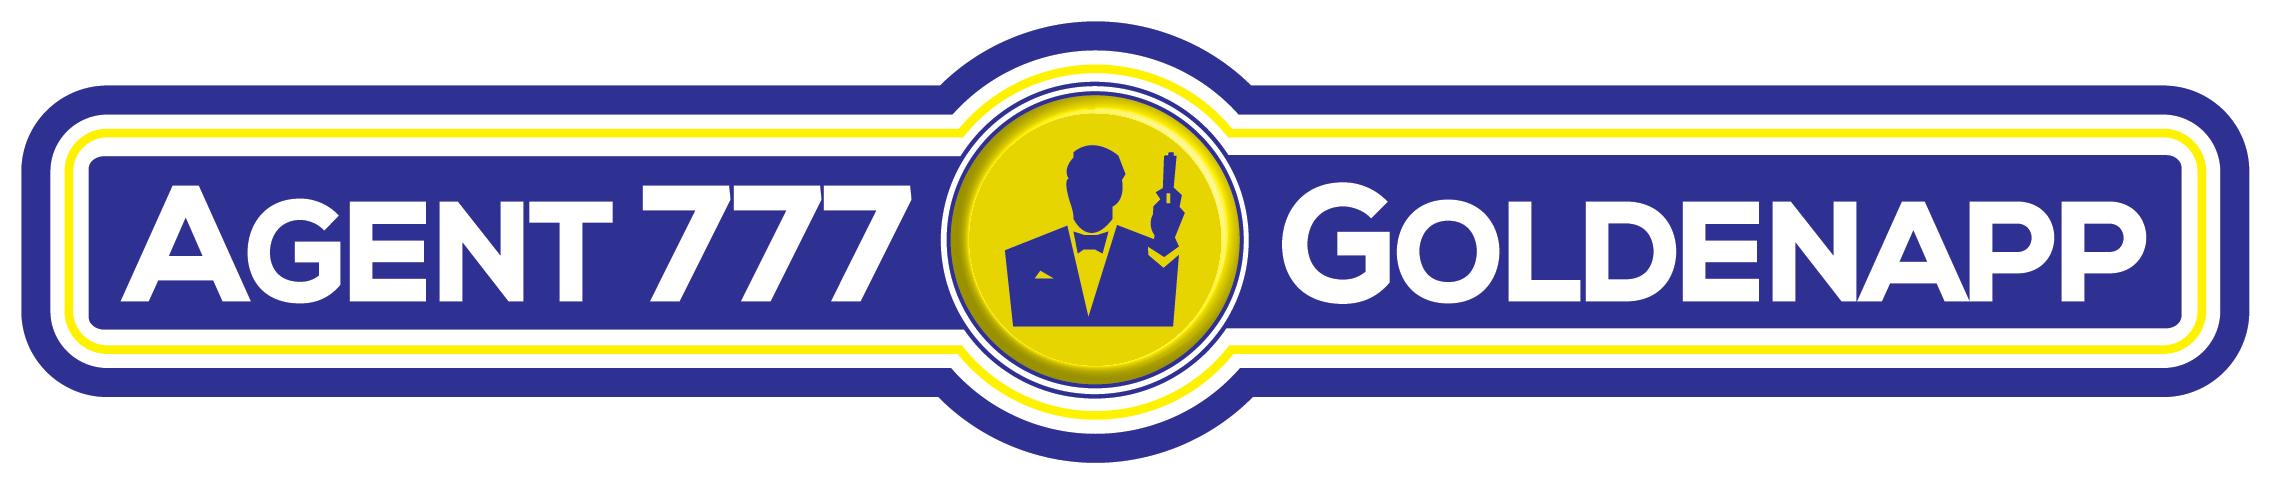 Agent 777 Goldenapp